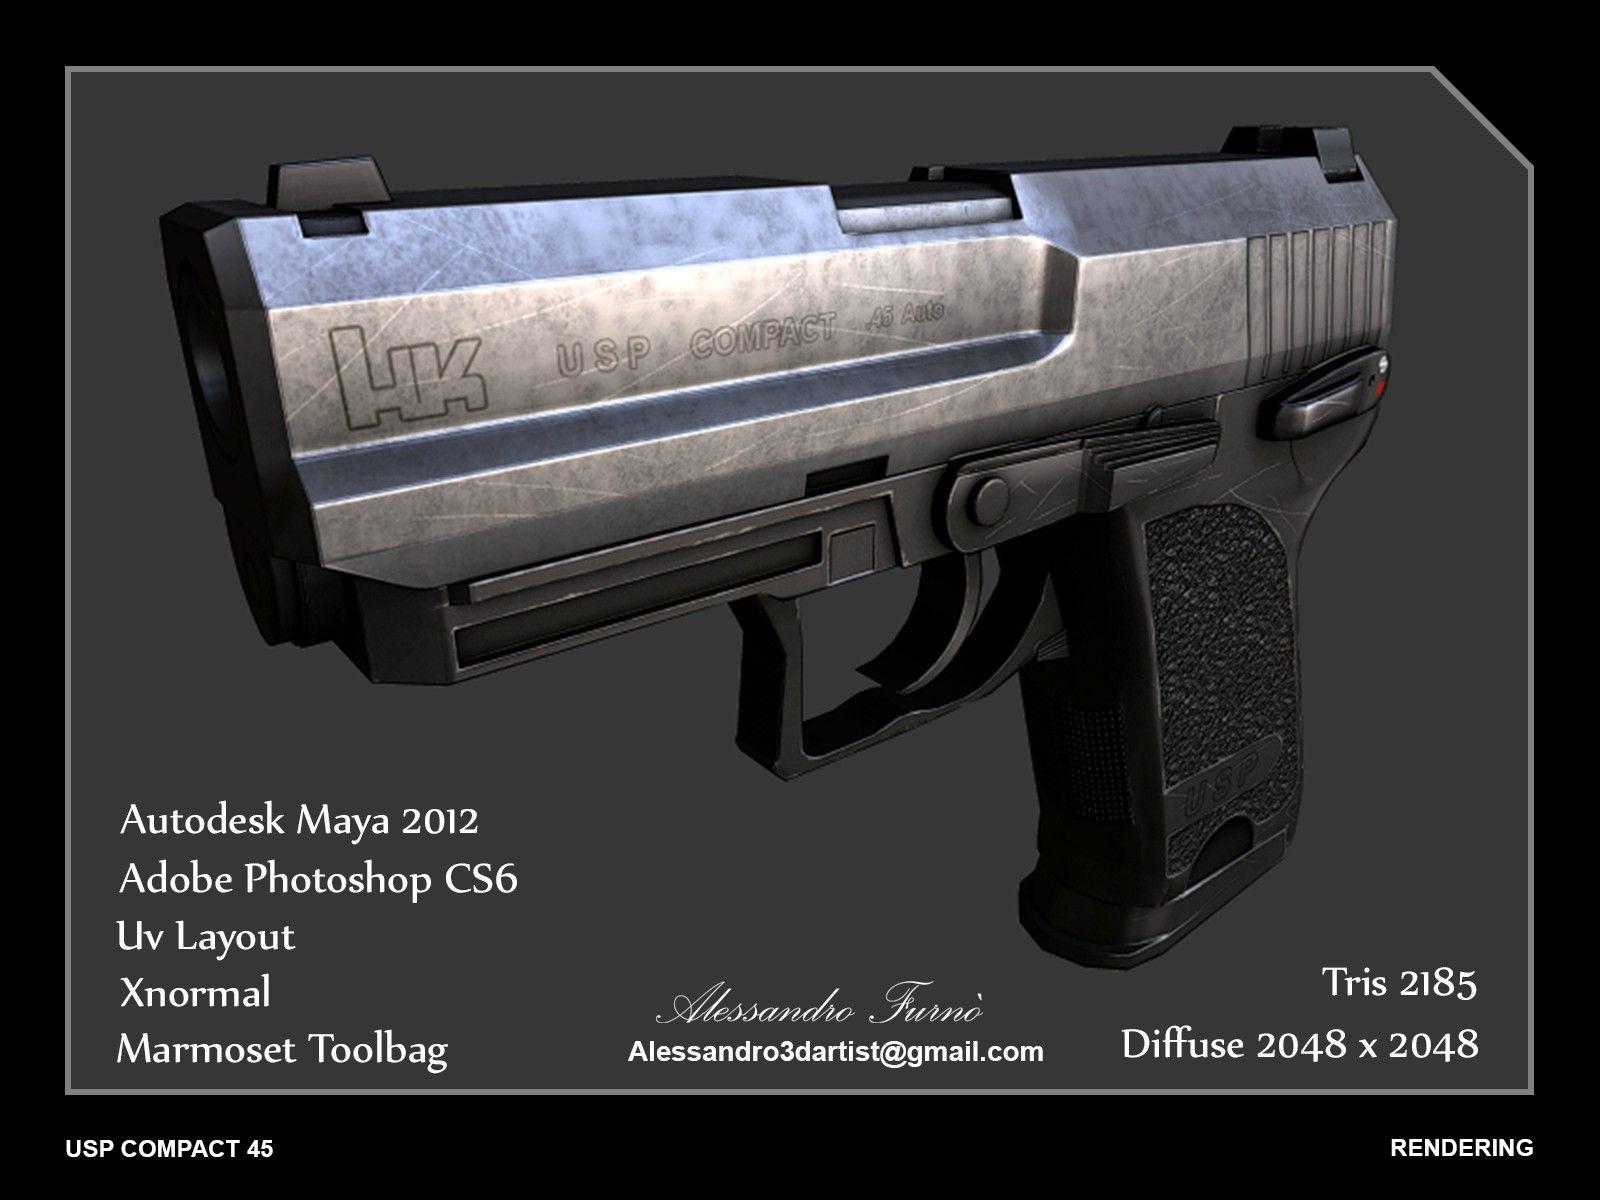 New renders by Alessandro Furnio http//bit.ly/1hFeYFA